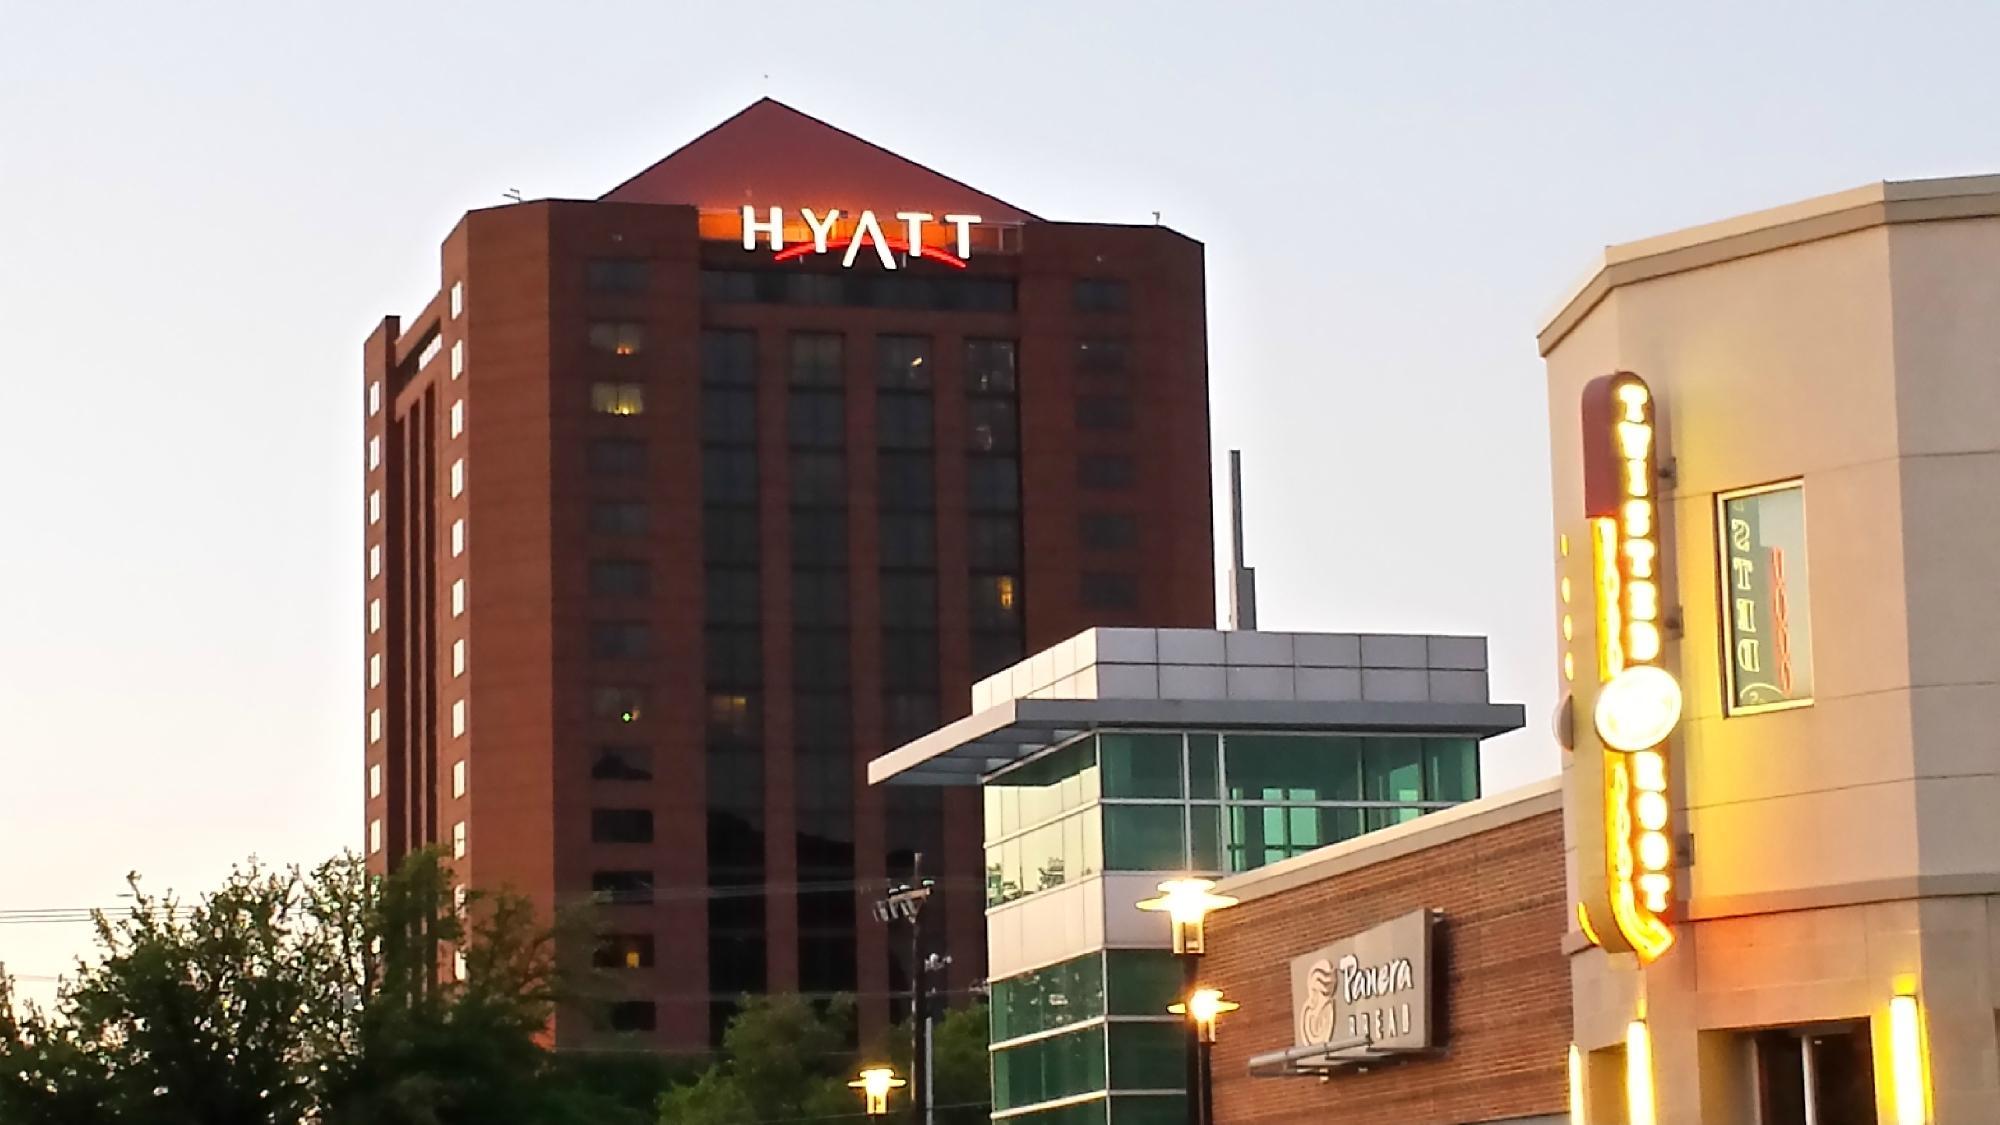 Hyatt Regency North Dallas/Richardson